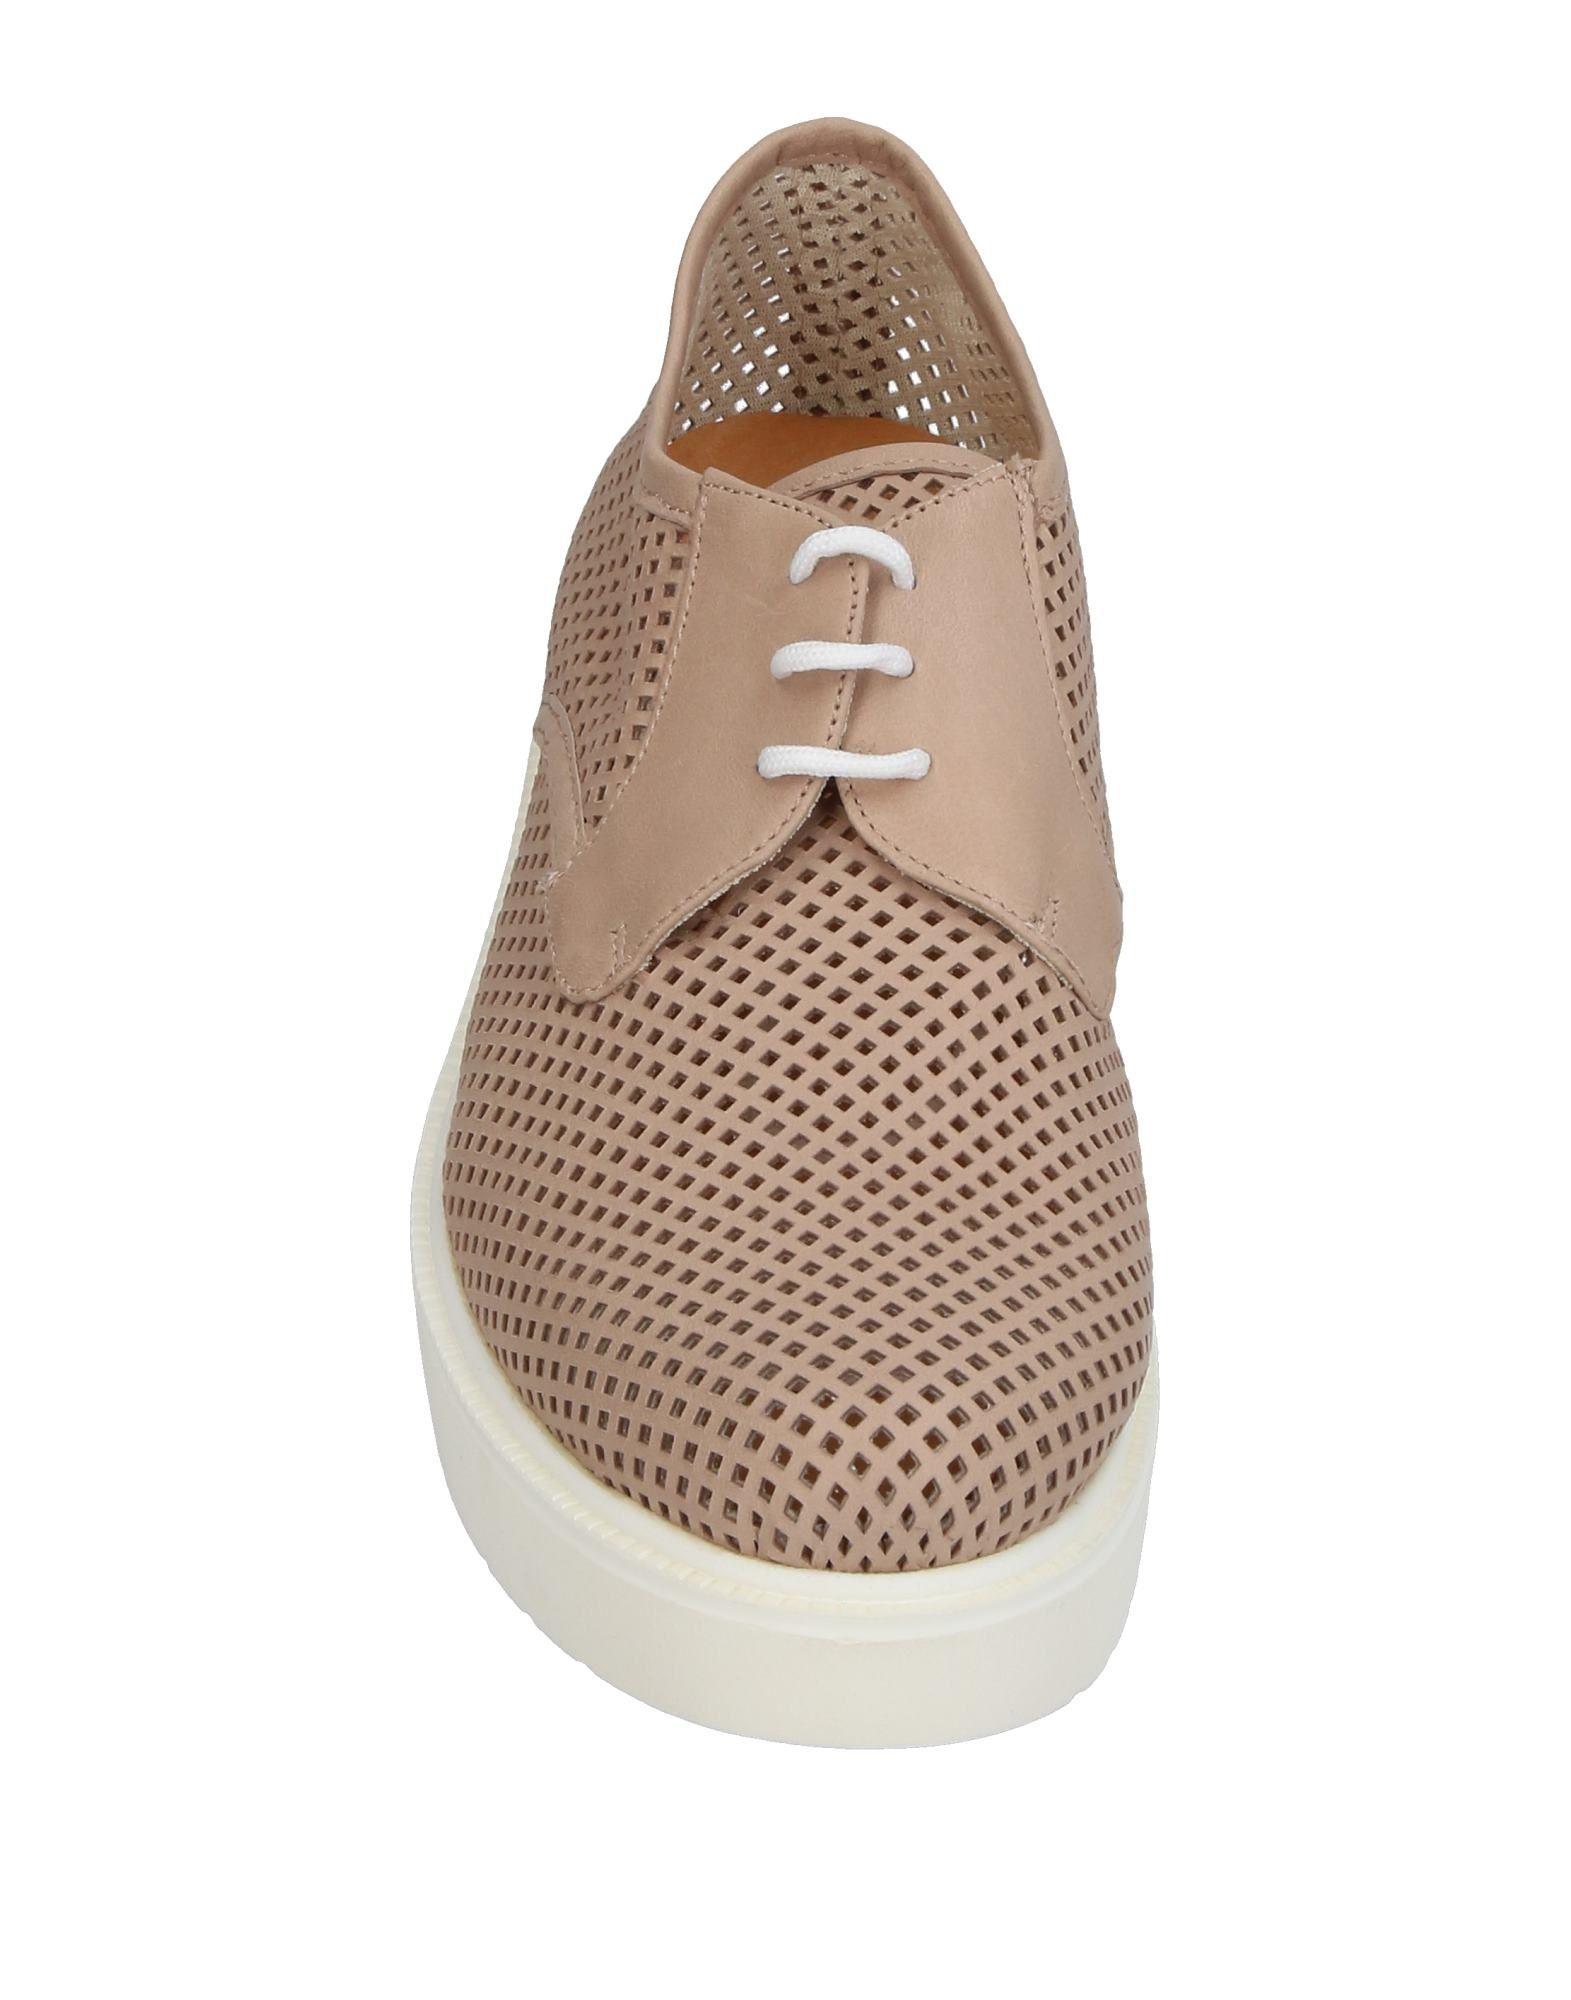 CHAUSSURES - Chaussures à lacetsPaola Ferri TaIGoxT